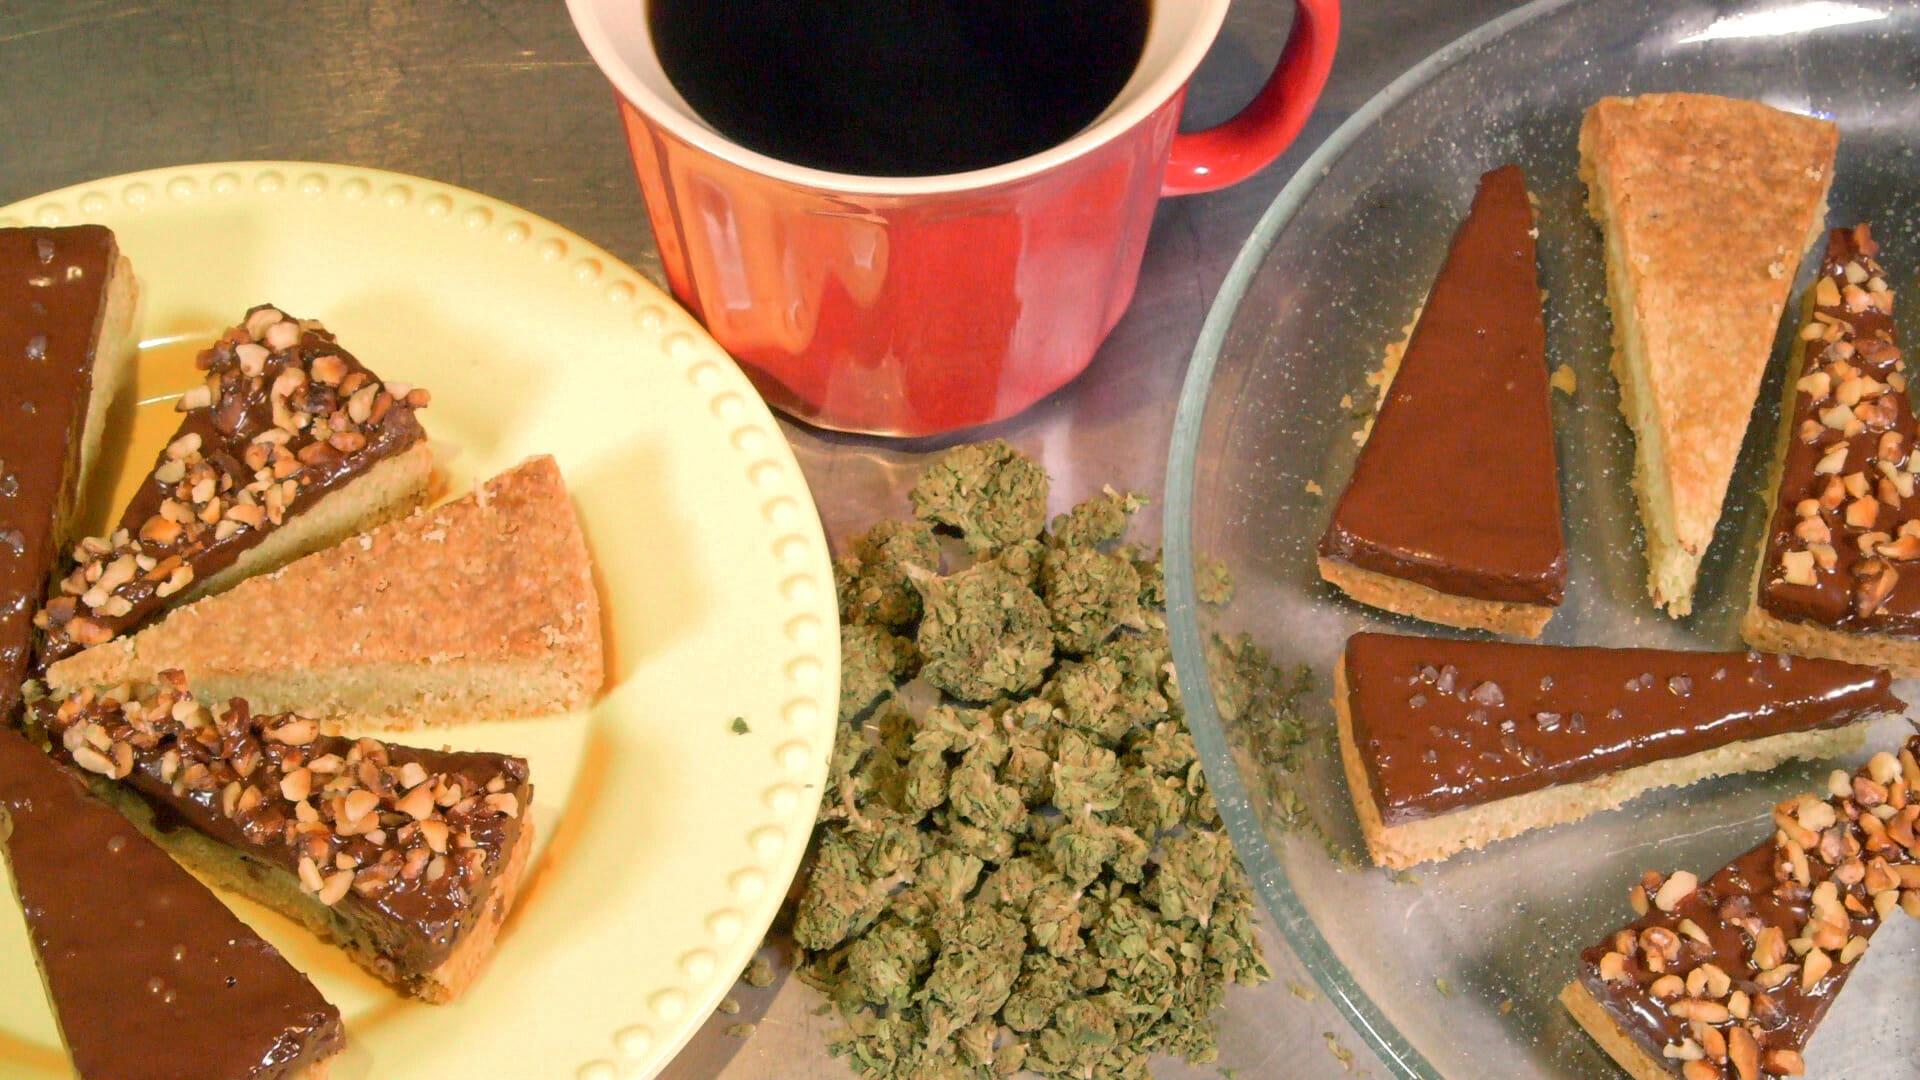 scottish-shortbread-cookies-recipe-infused-eats-thumbnail-1